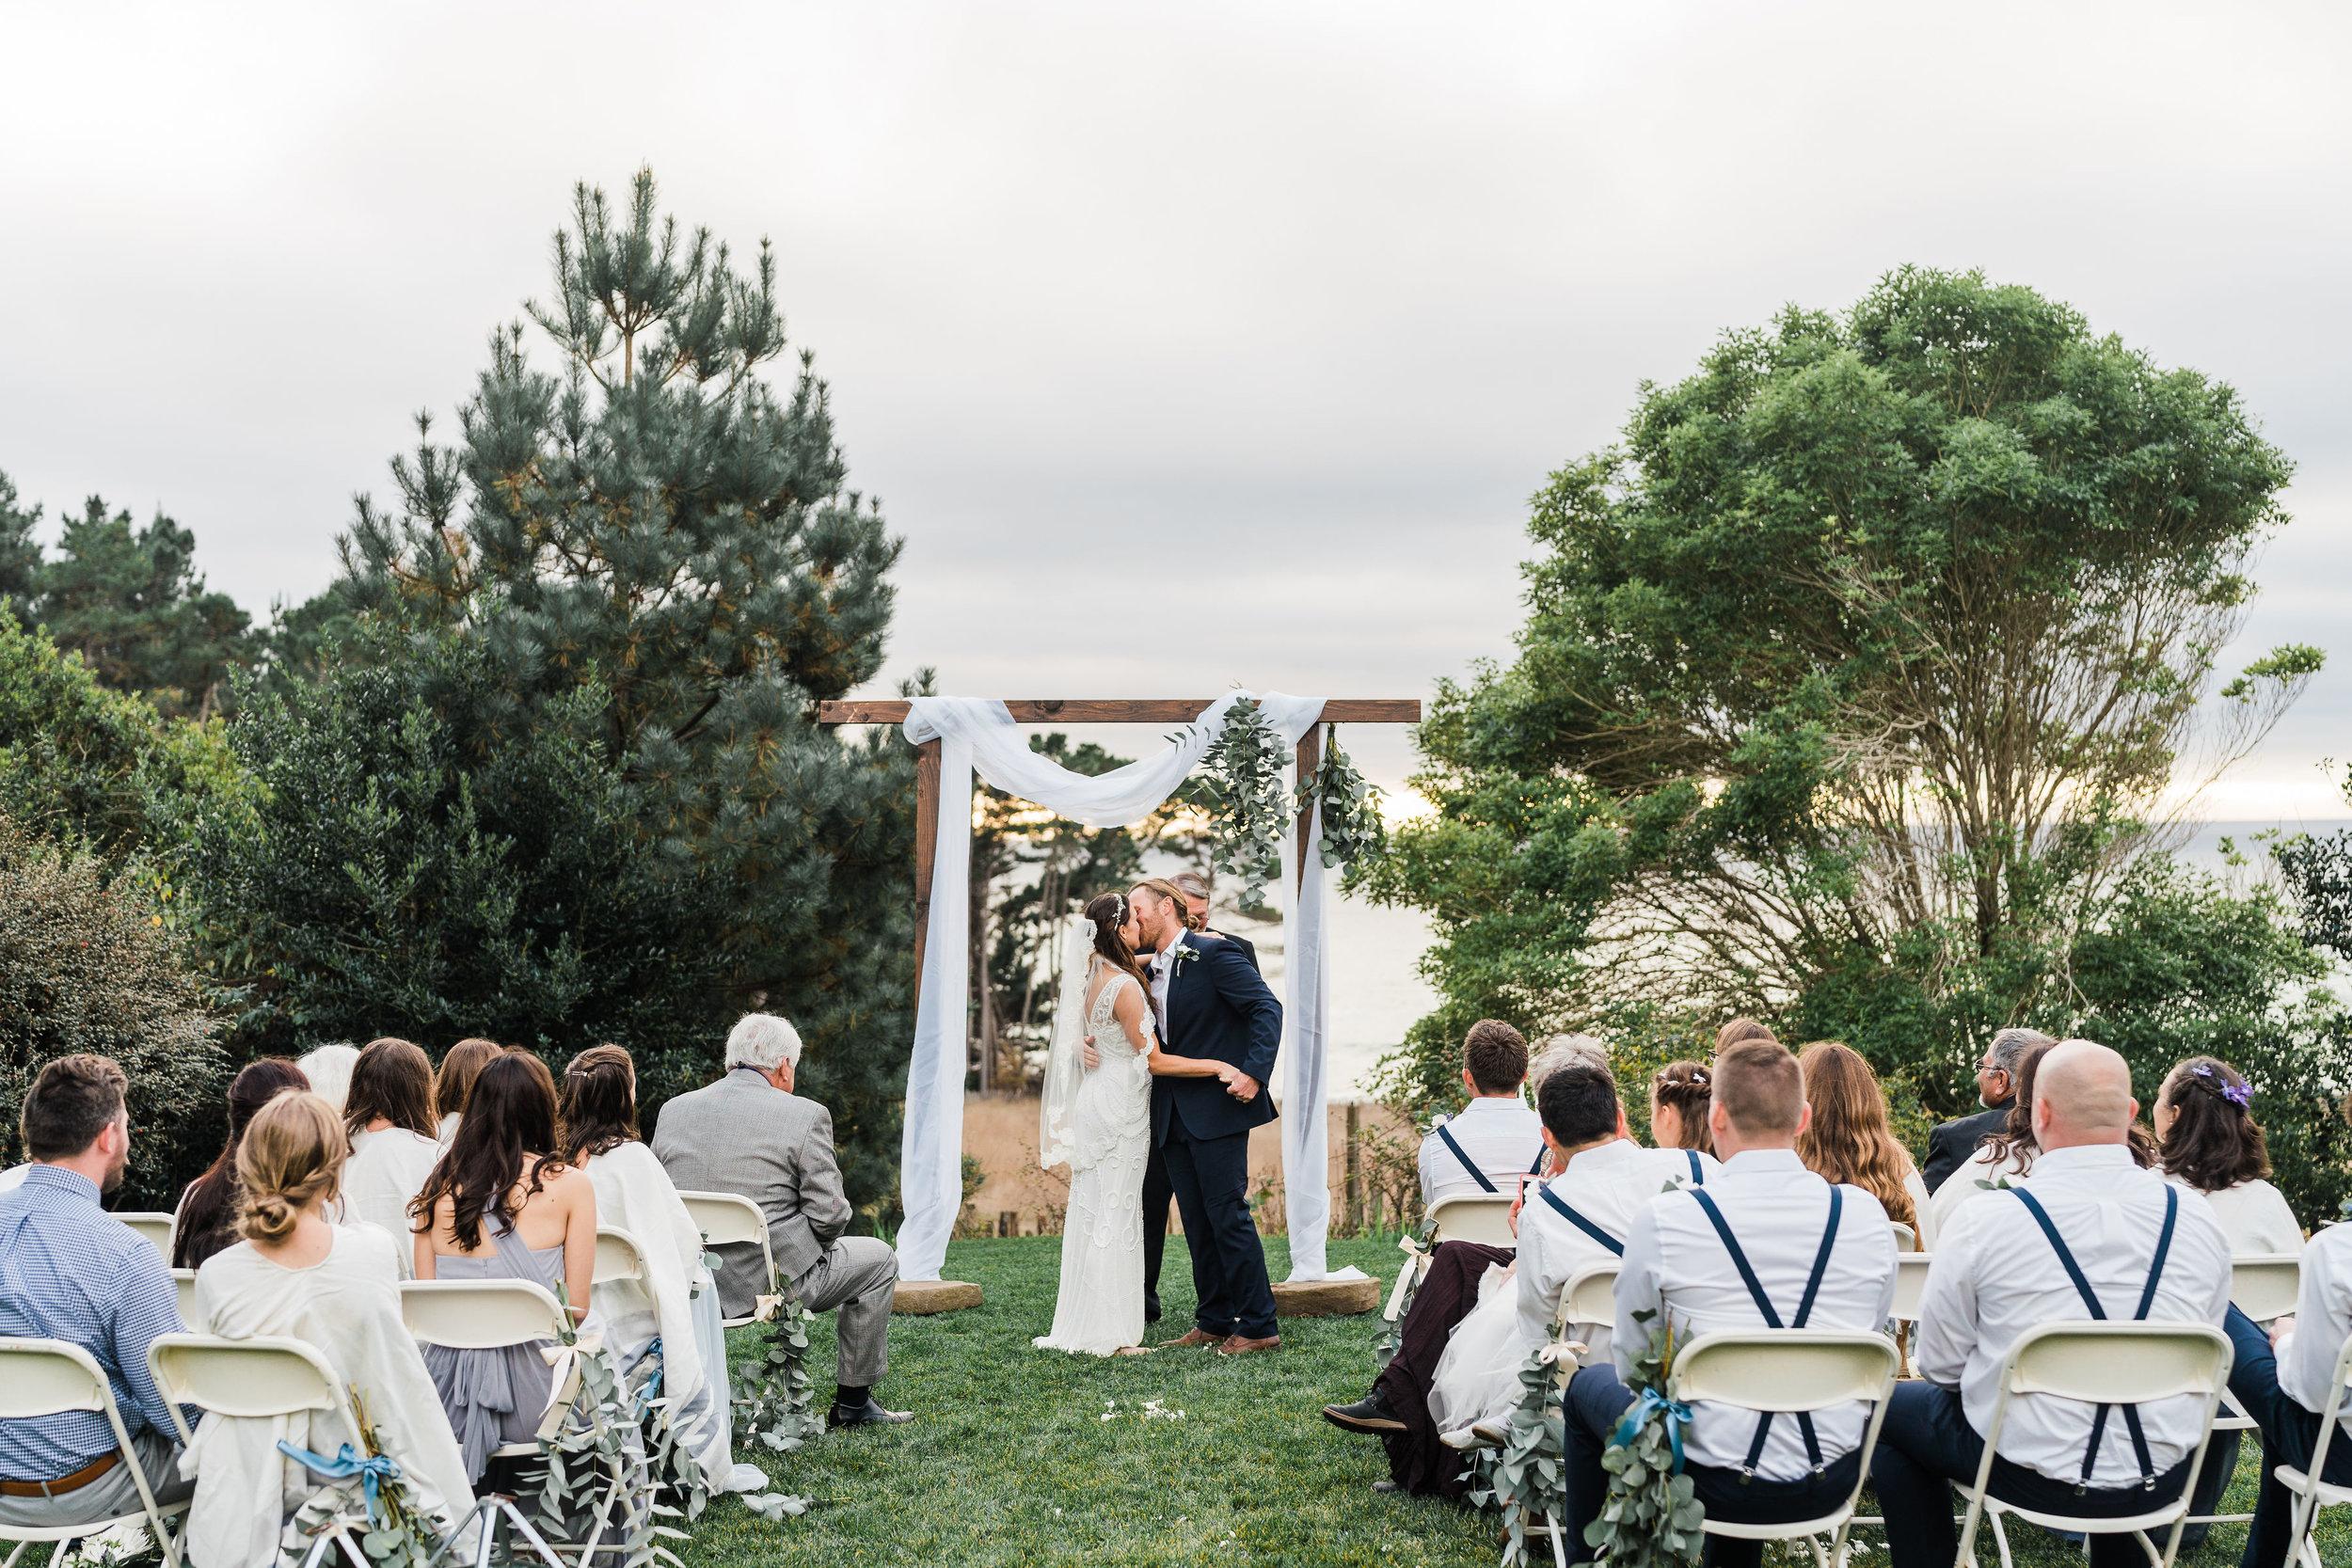 switzer-farm-wedding-westport-brandon-bibbins-photograhy-fine-art-063.jpg